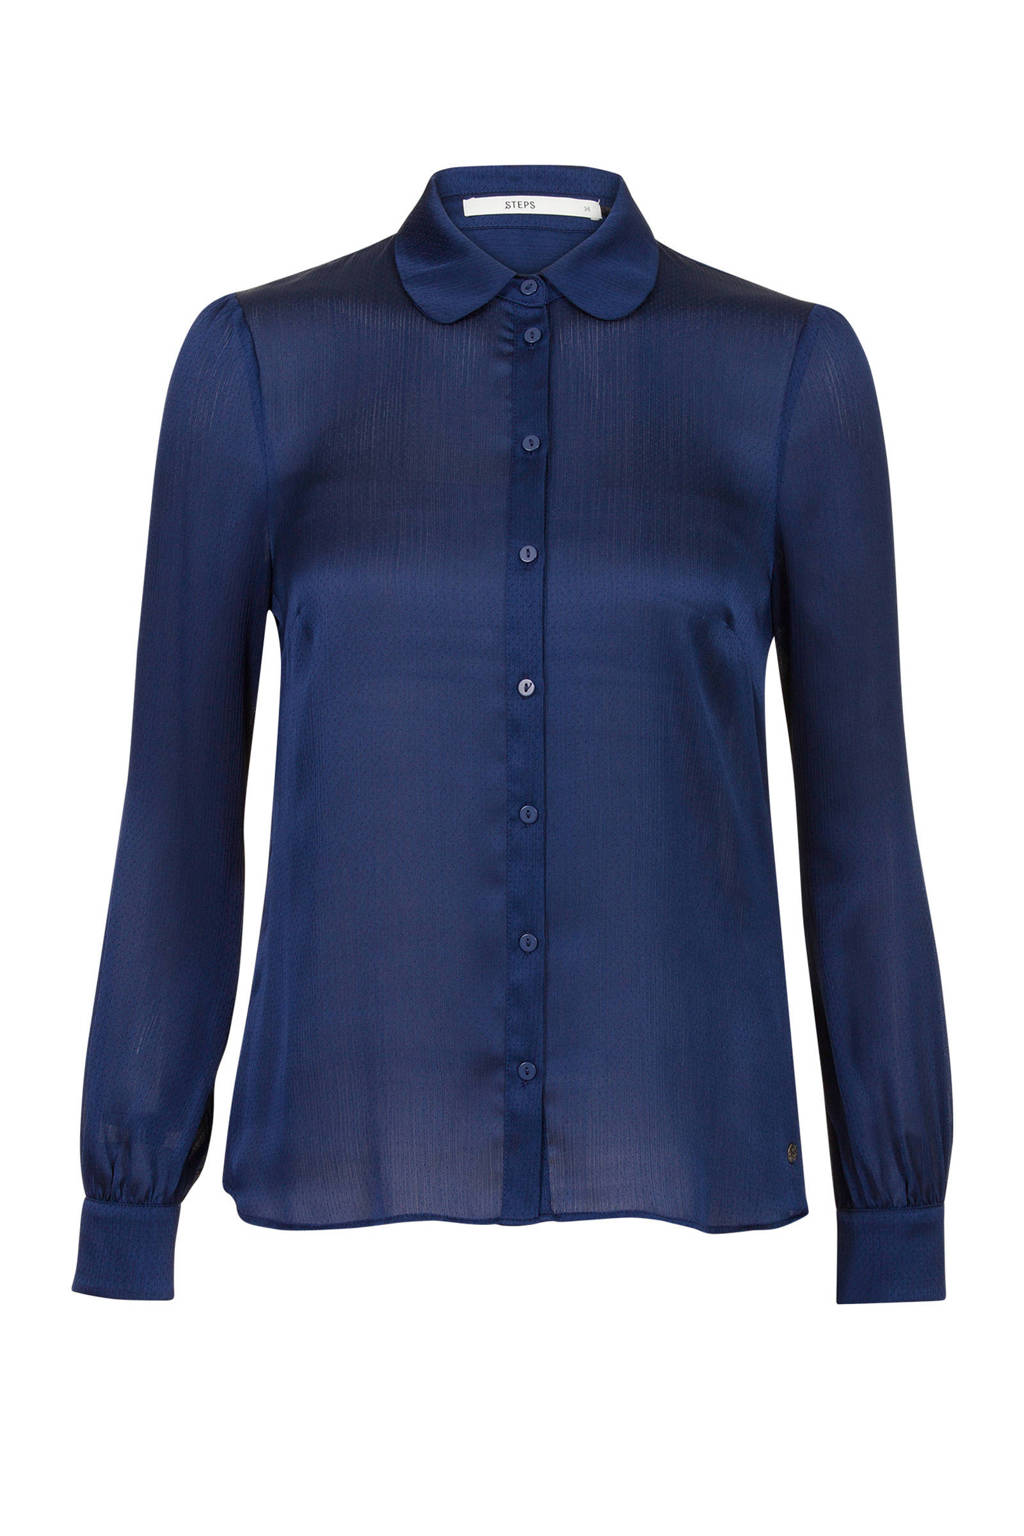 Steps blouse met textuur marine blauw, Marine